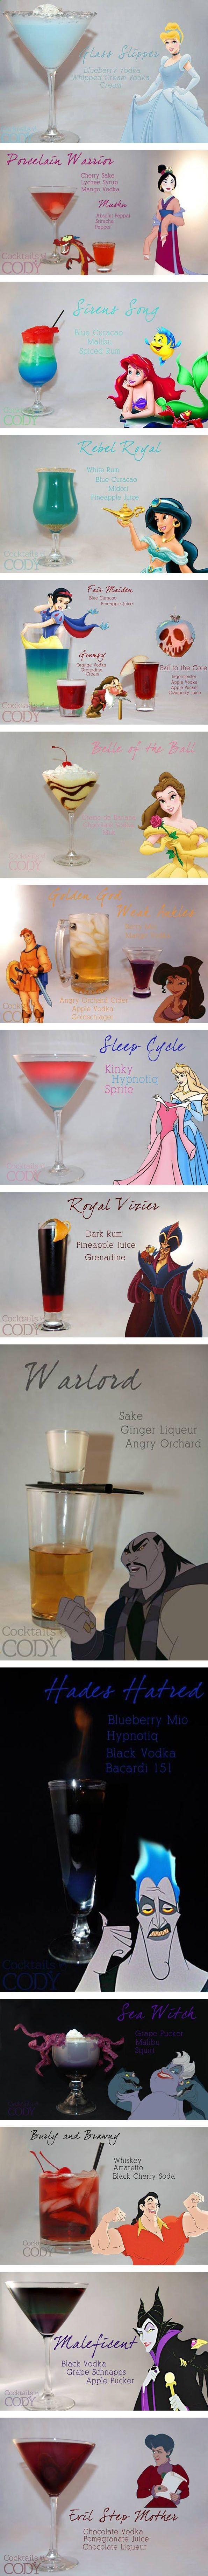 Disney princess themed cocktails